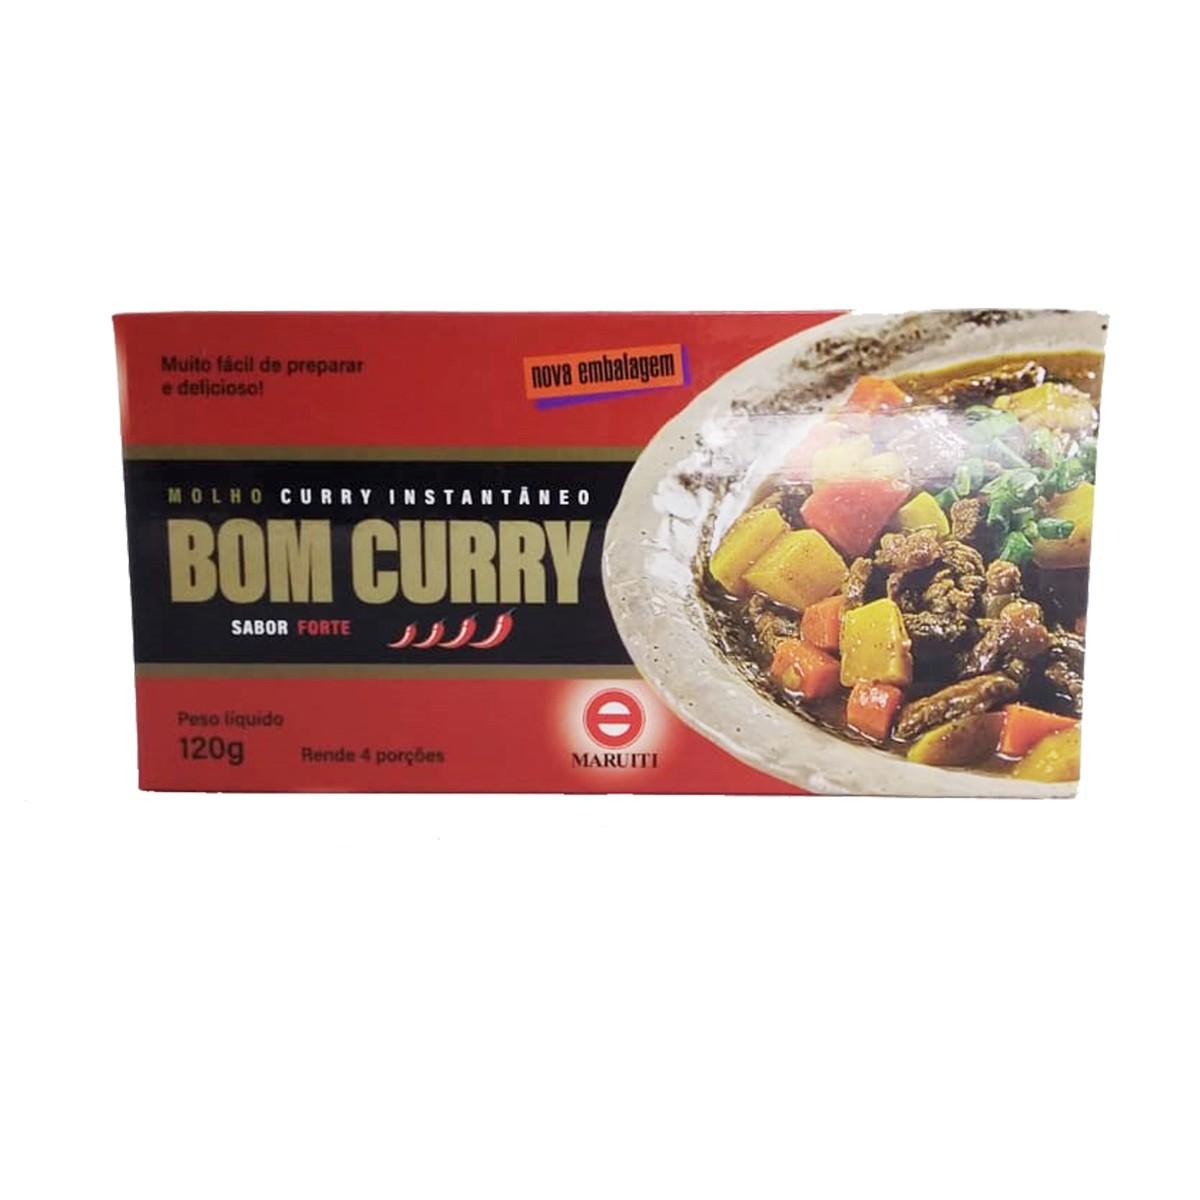 Tempero Bom Curry Sabor Forte 120g - Maruiti